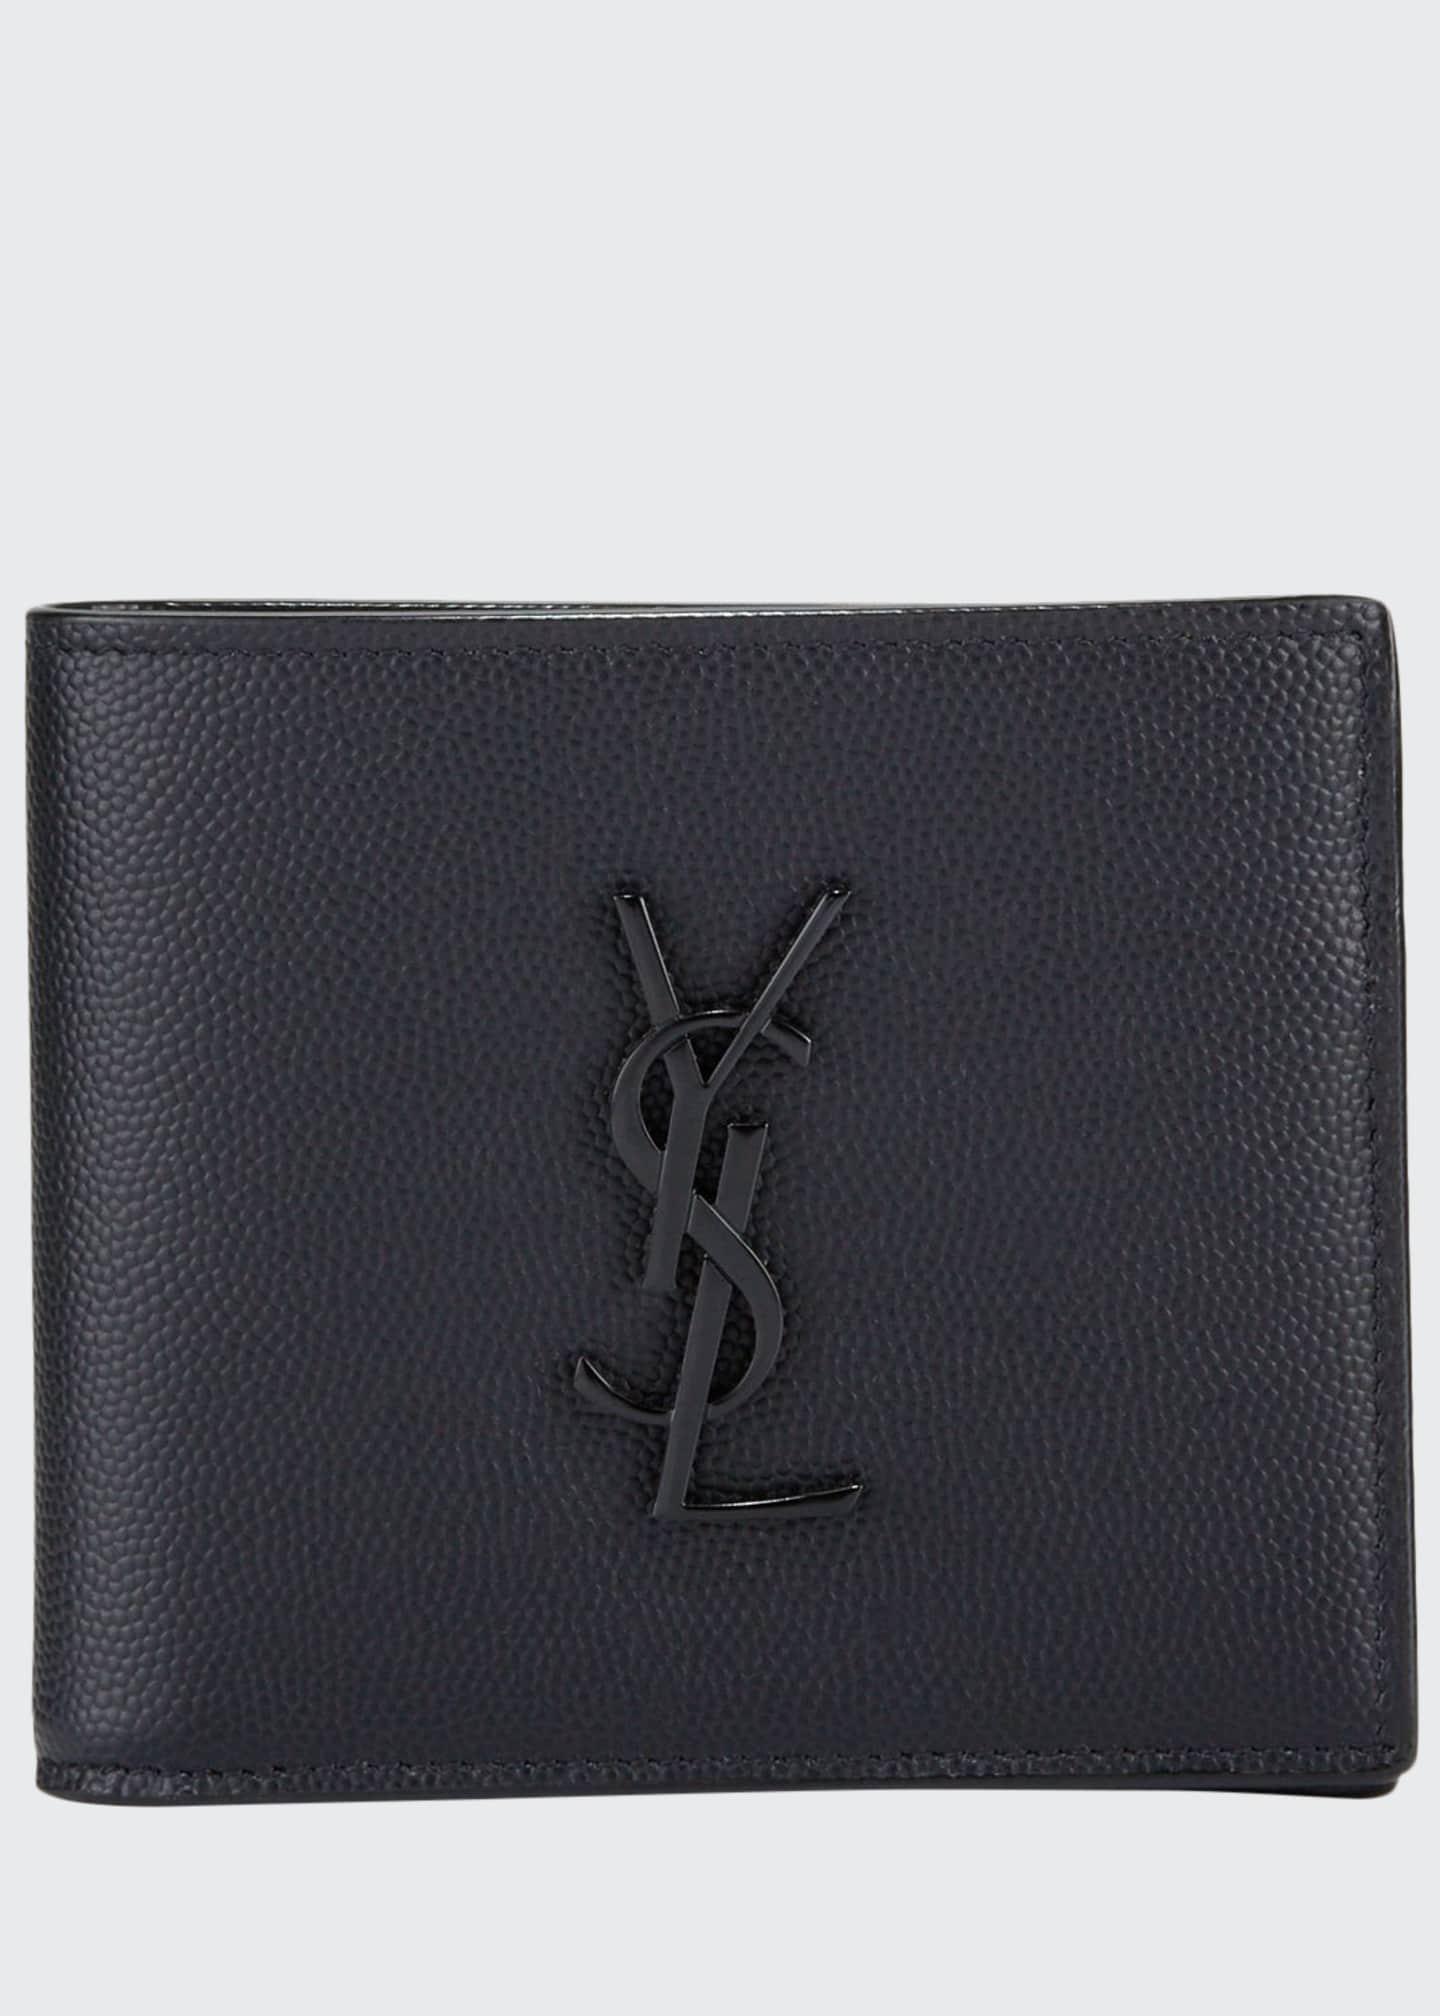 Saint Laurent Men's YSL Monogram Leather Wallet